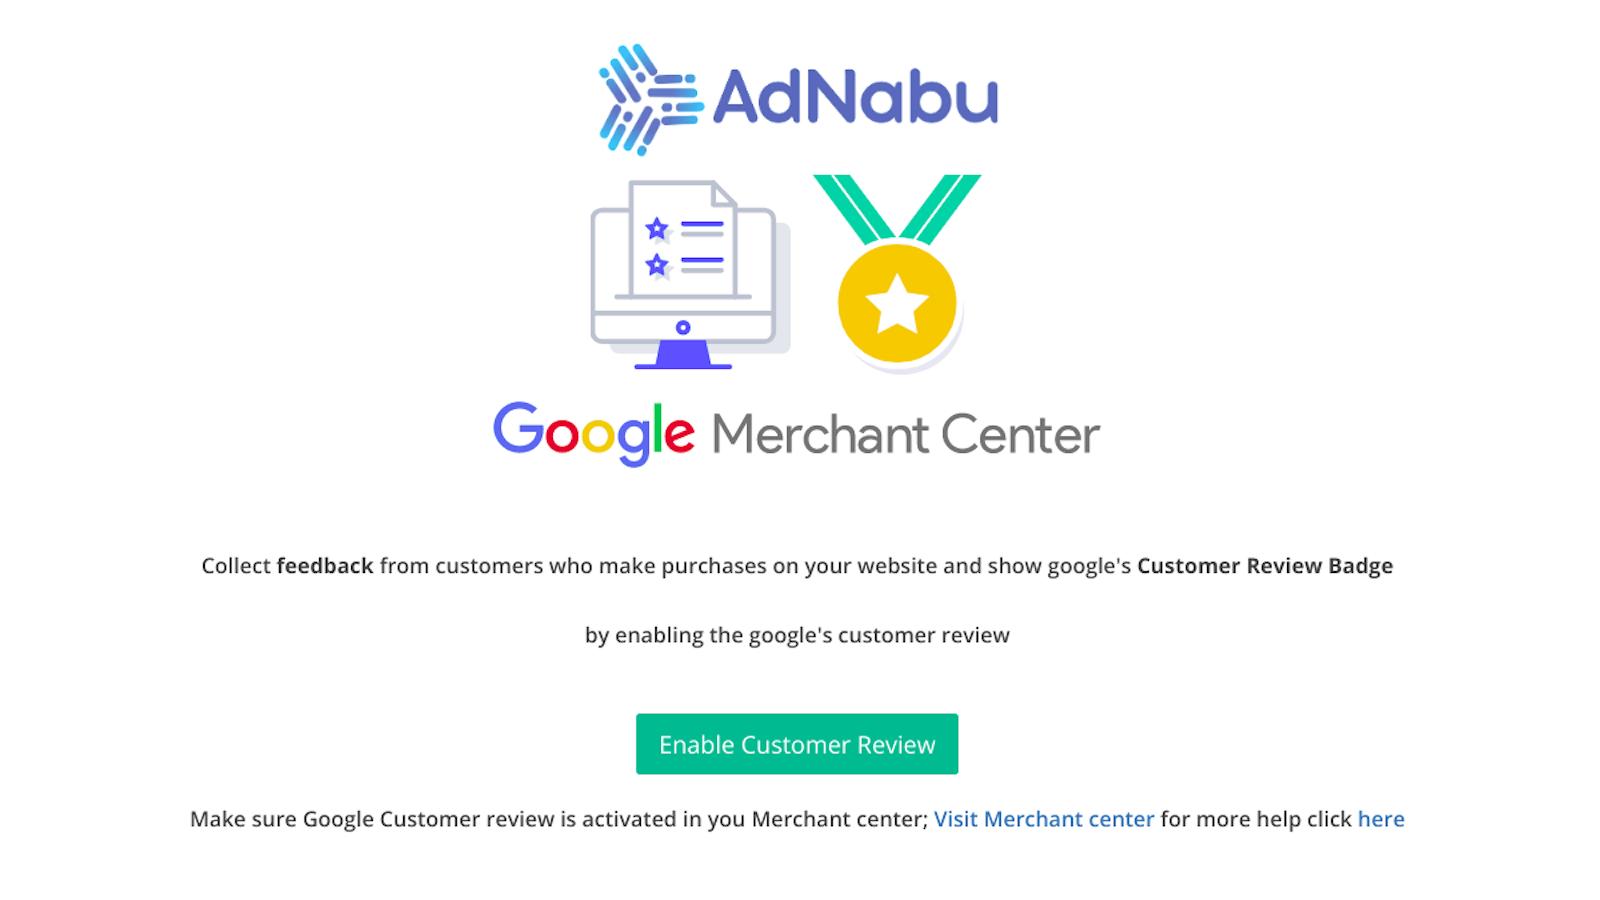 5. Google Customer Reviews by AdNabu